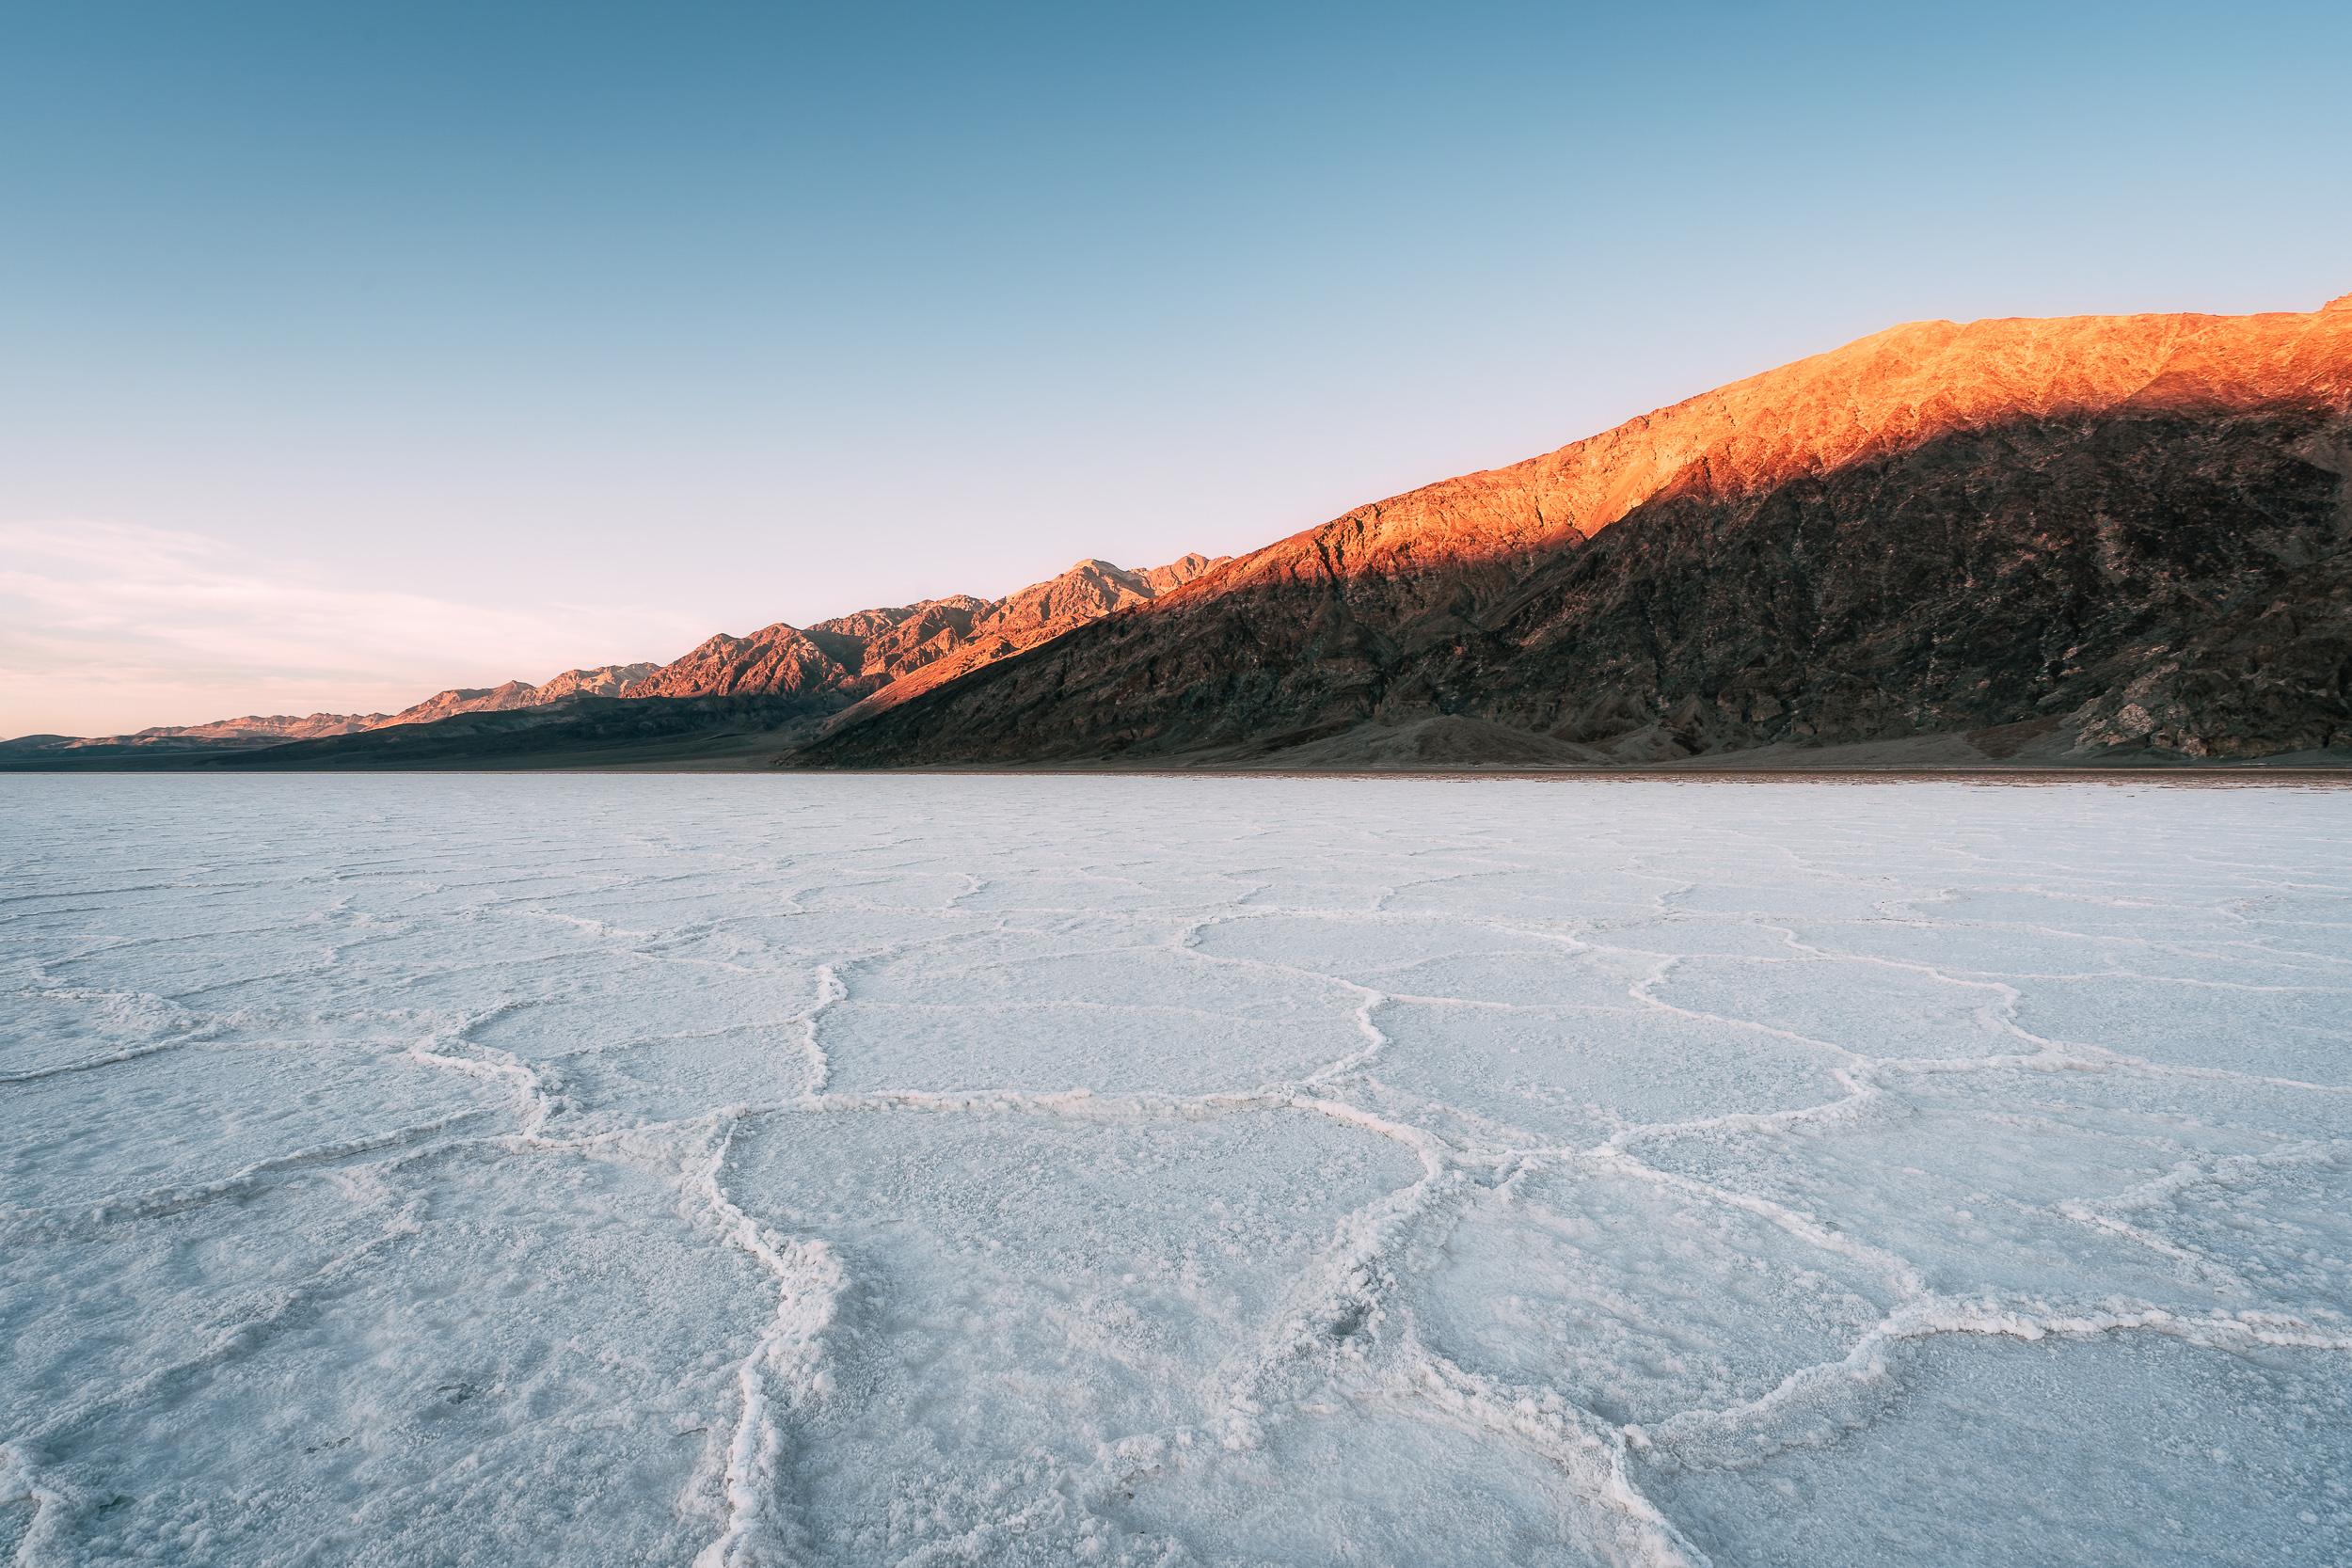 2018.09.23_Death_Valley-5844-Edit.jpg